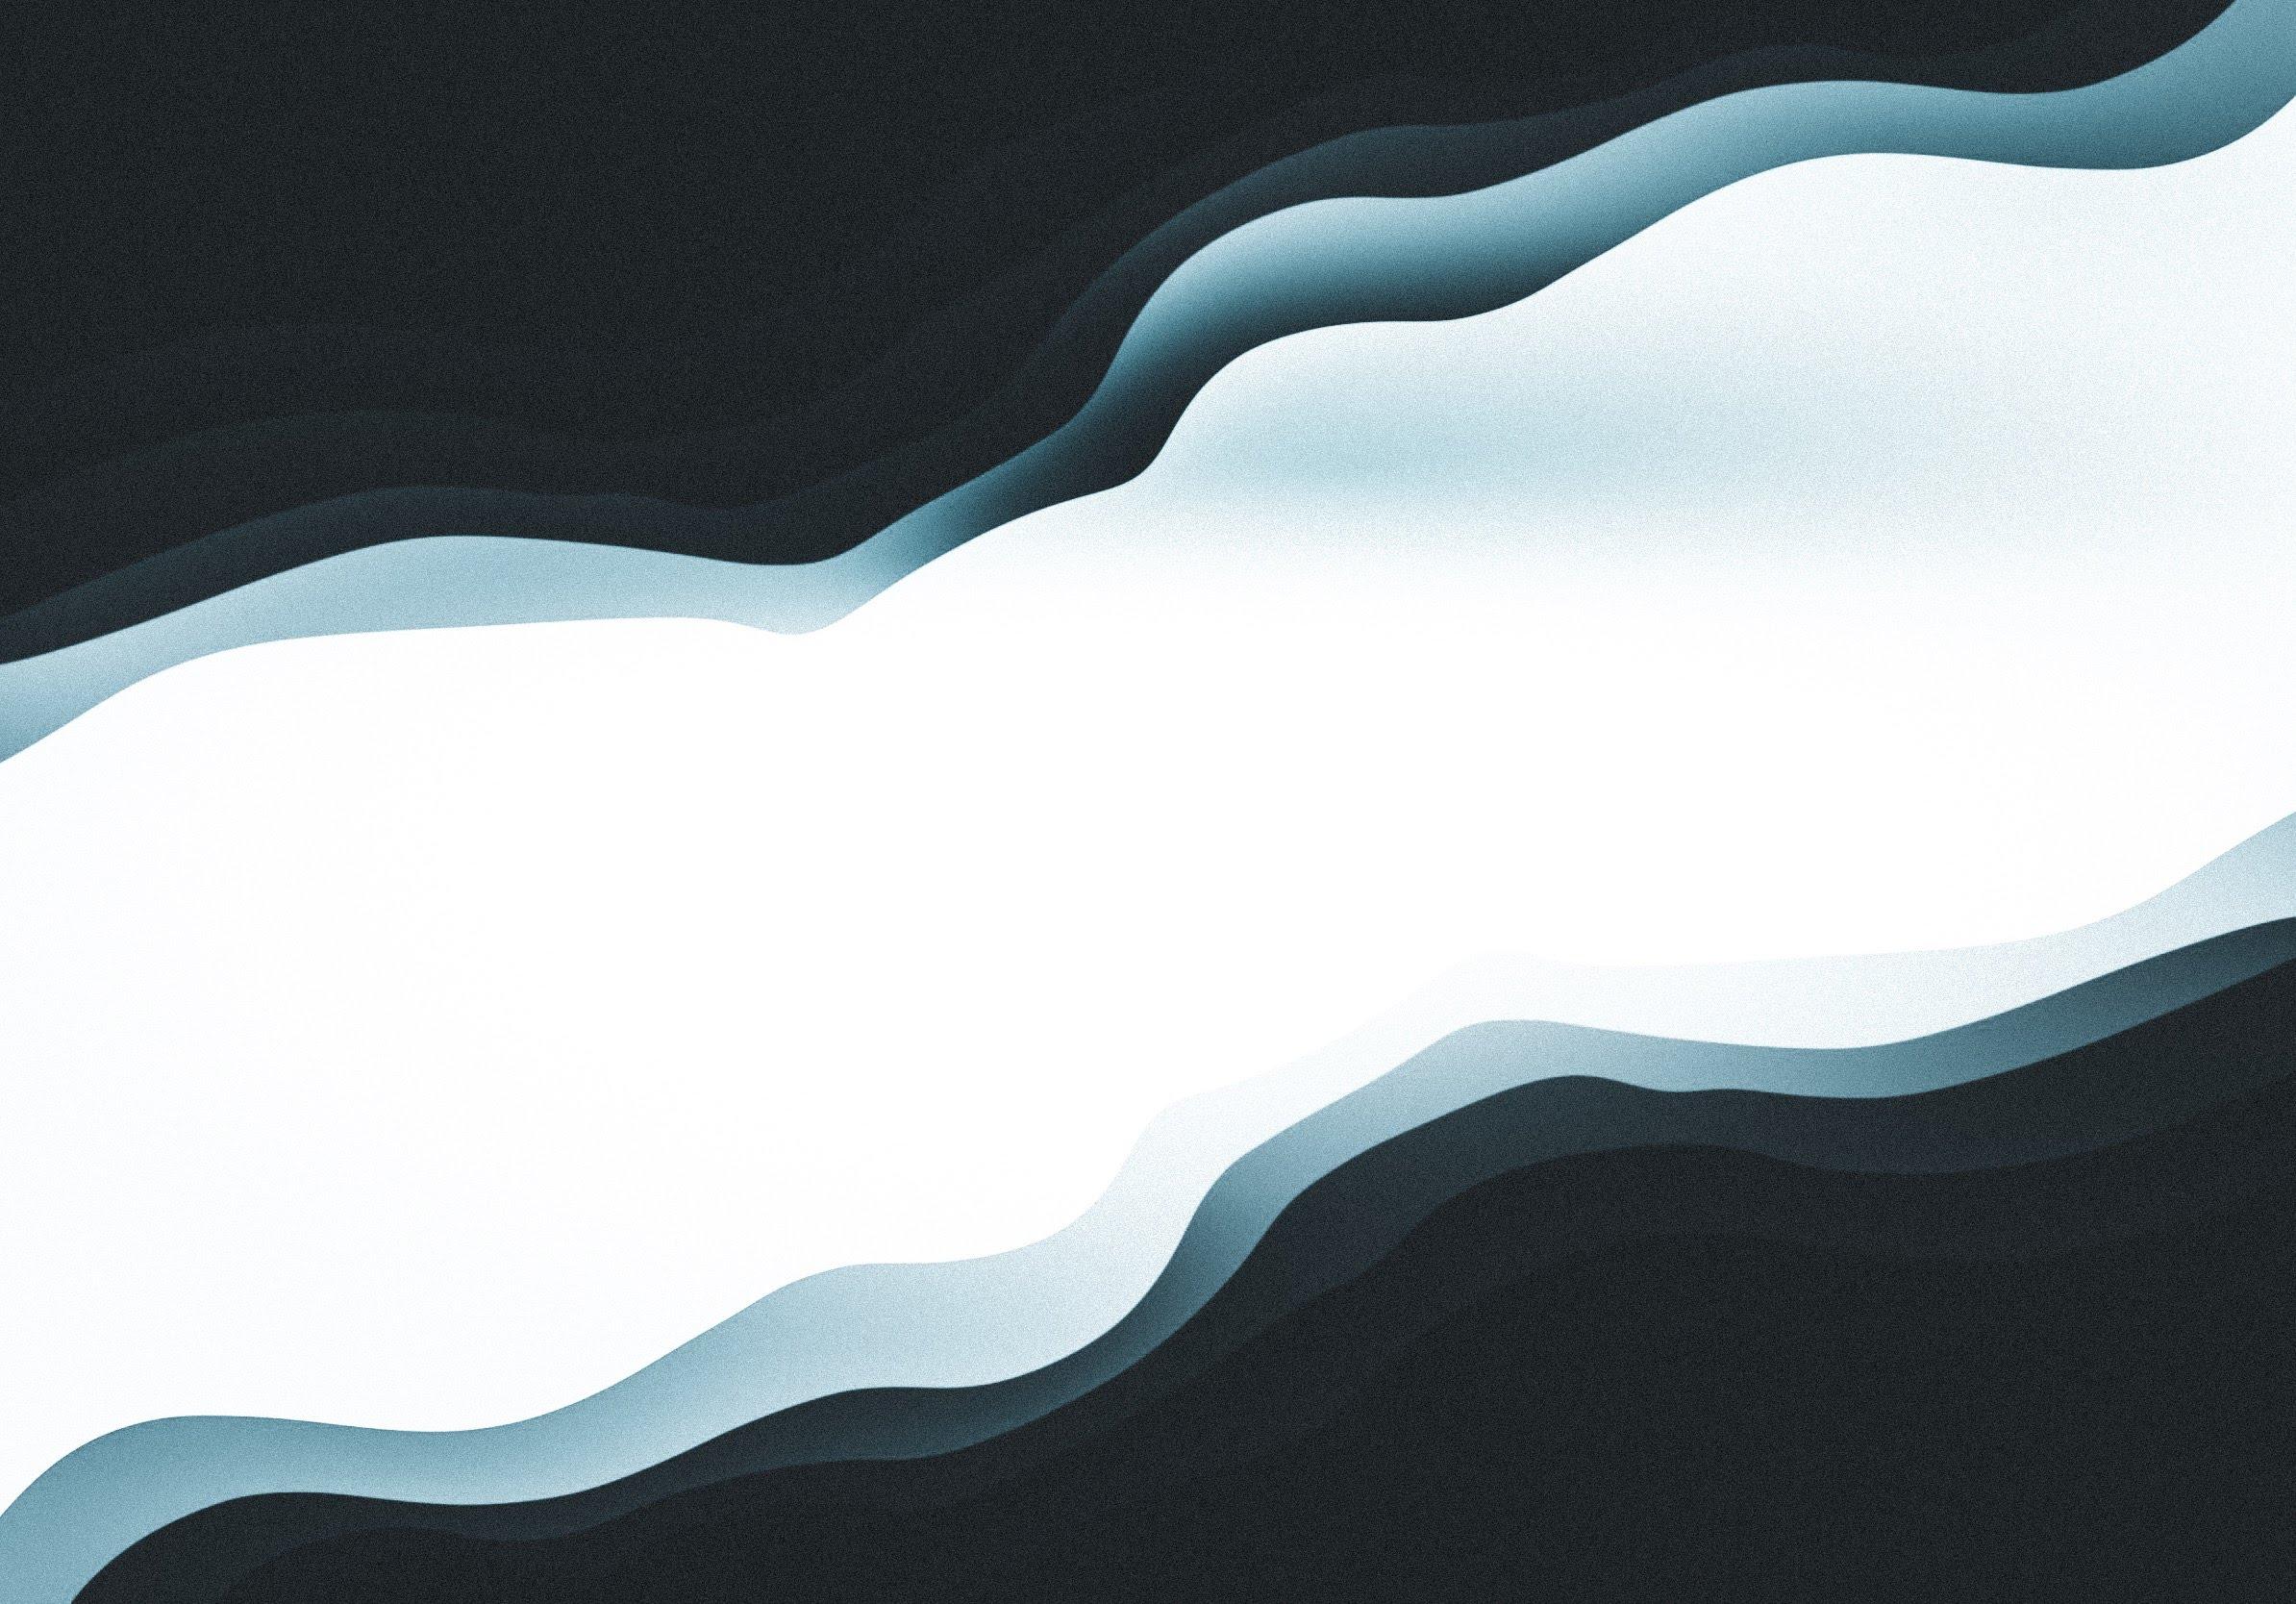 Minimal_Wave2_iPad_Wallpaper.jpg